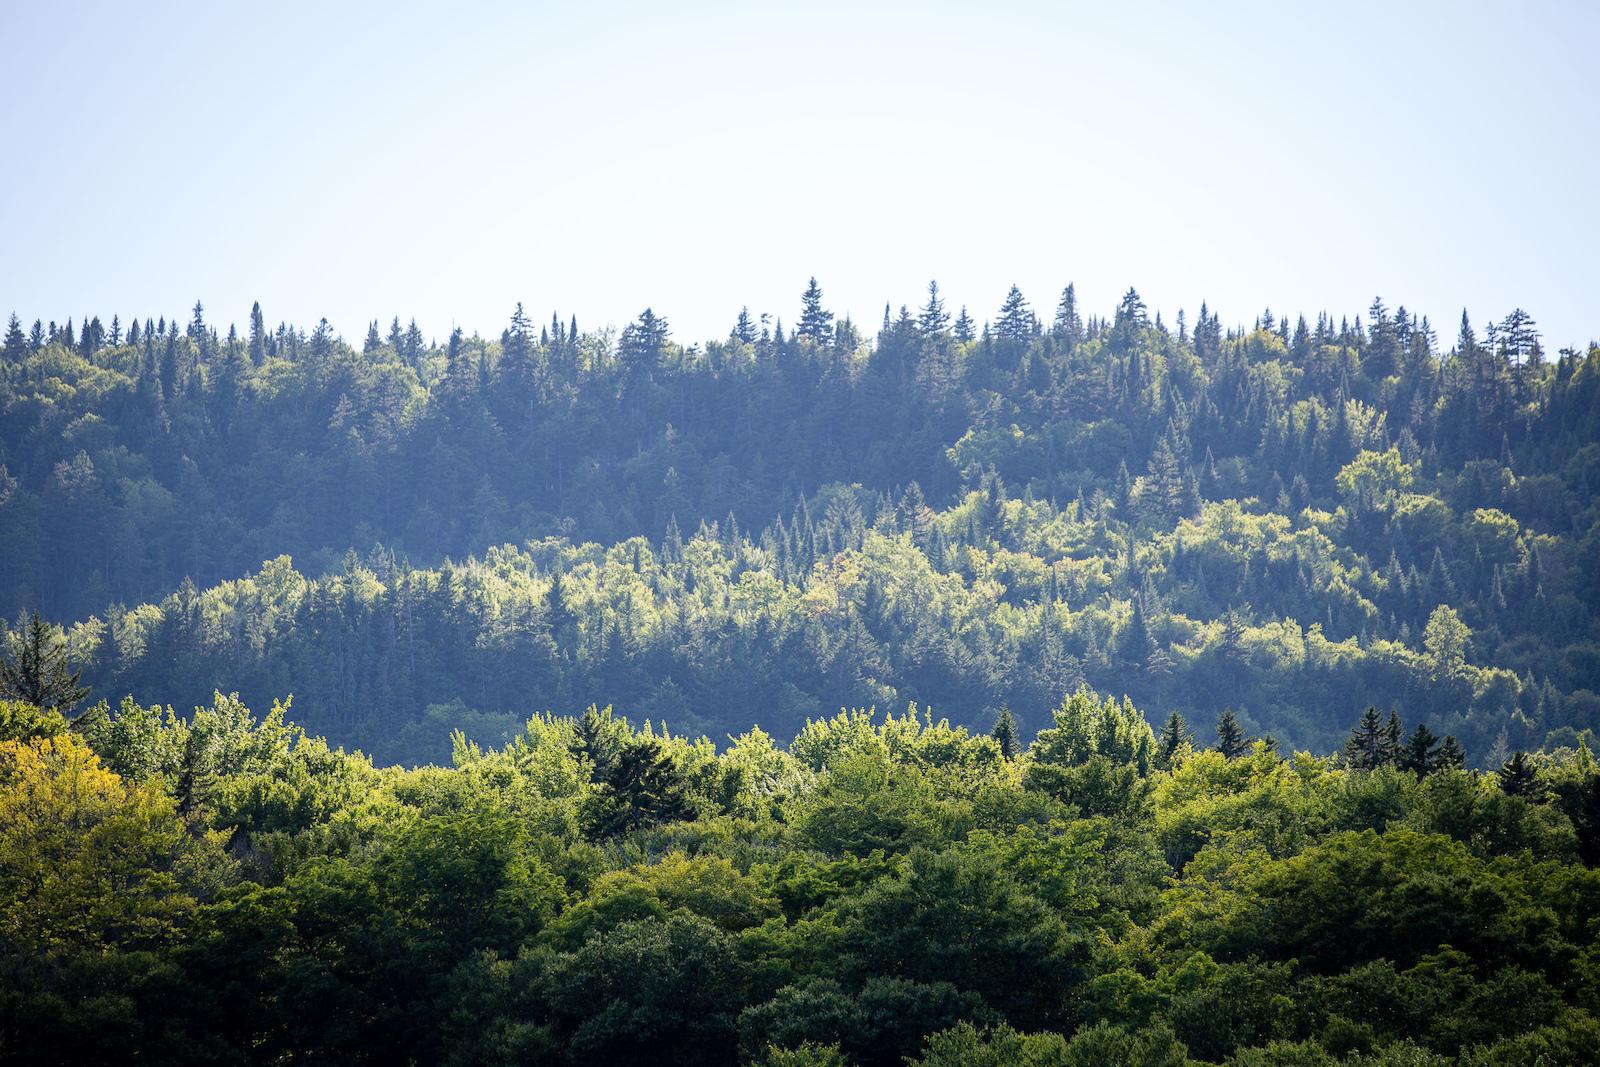 Forests for forest s sake. PHOTO Ben Gavelda